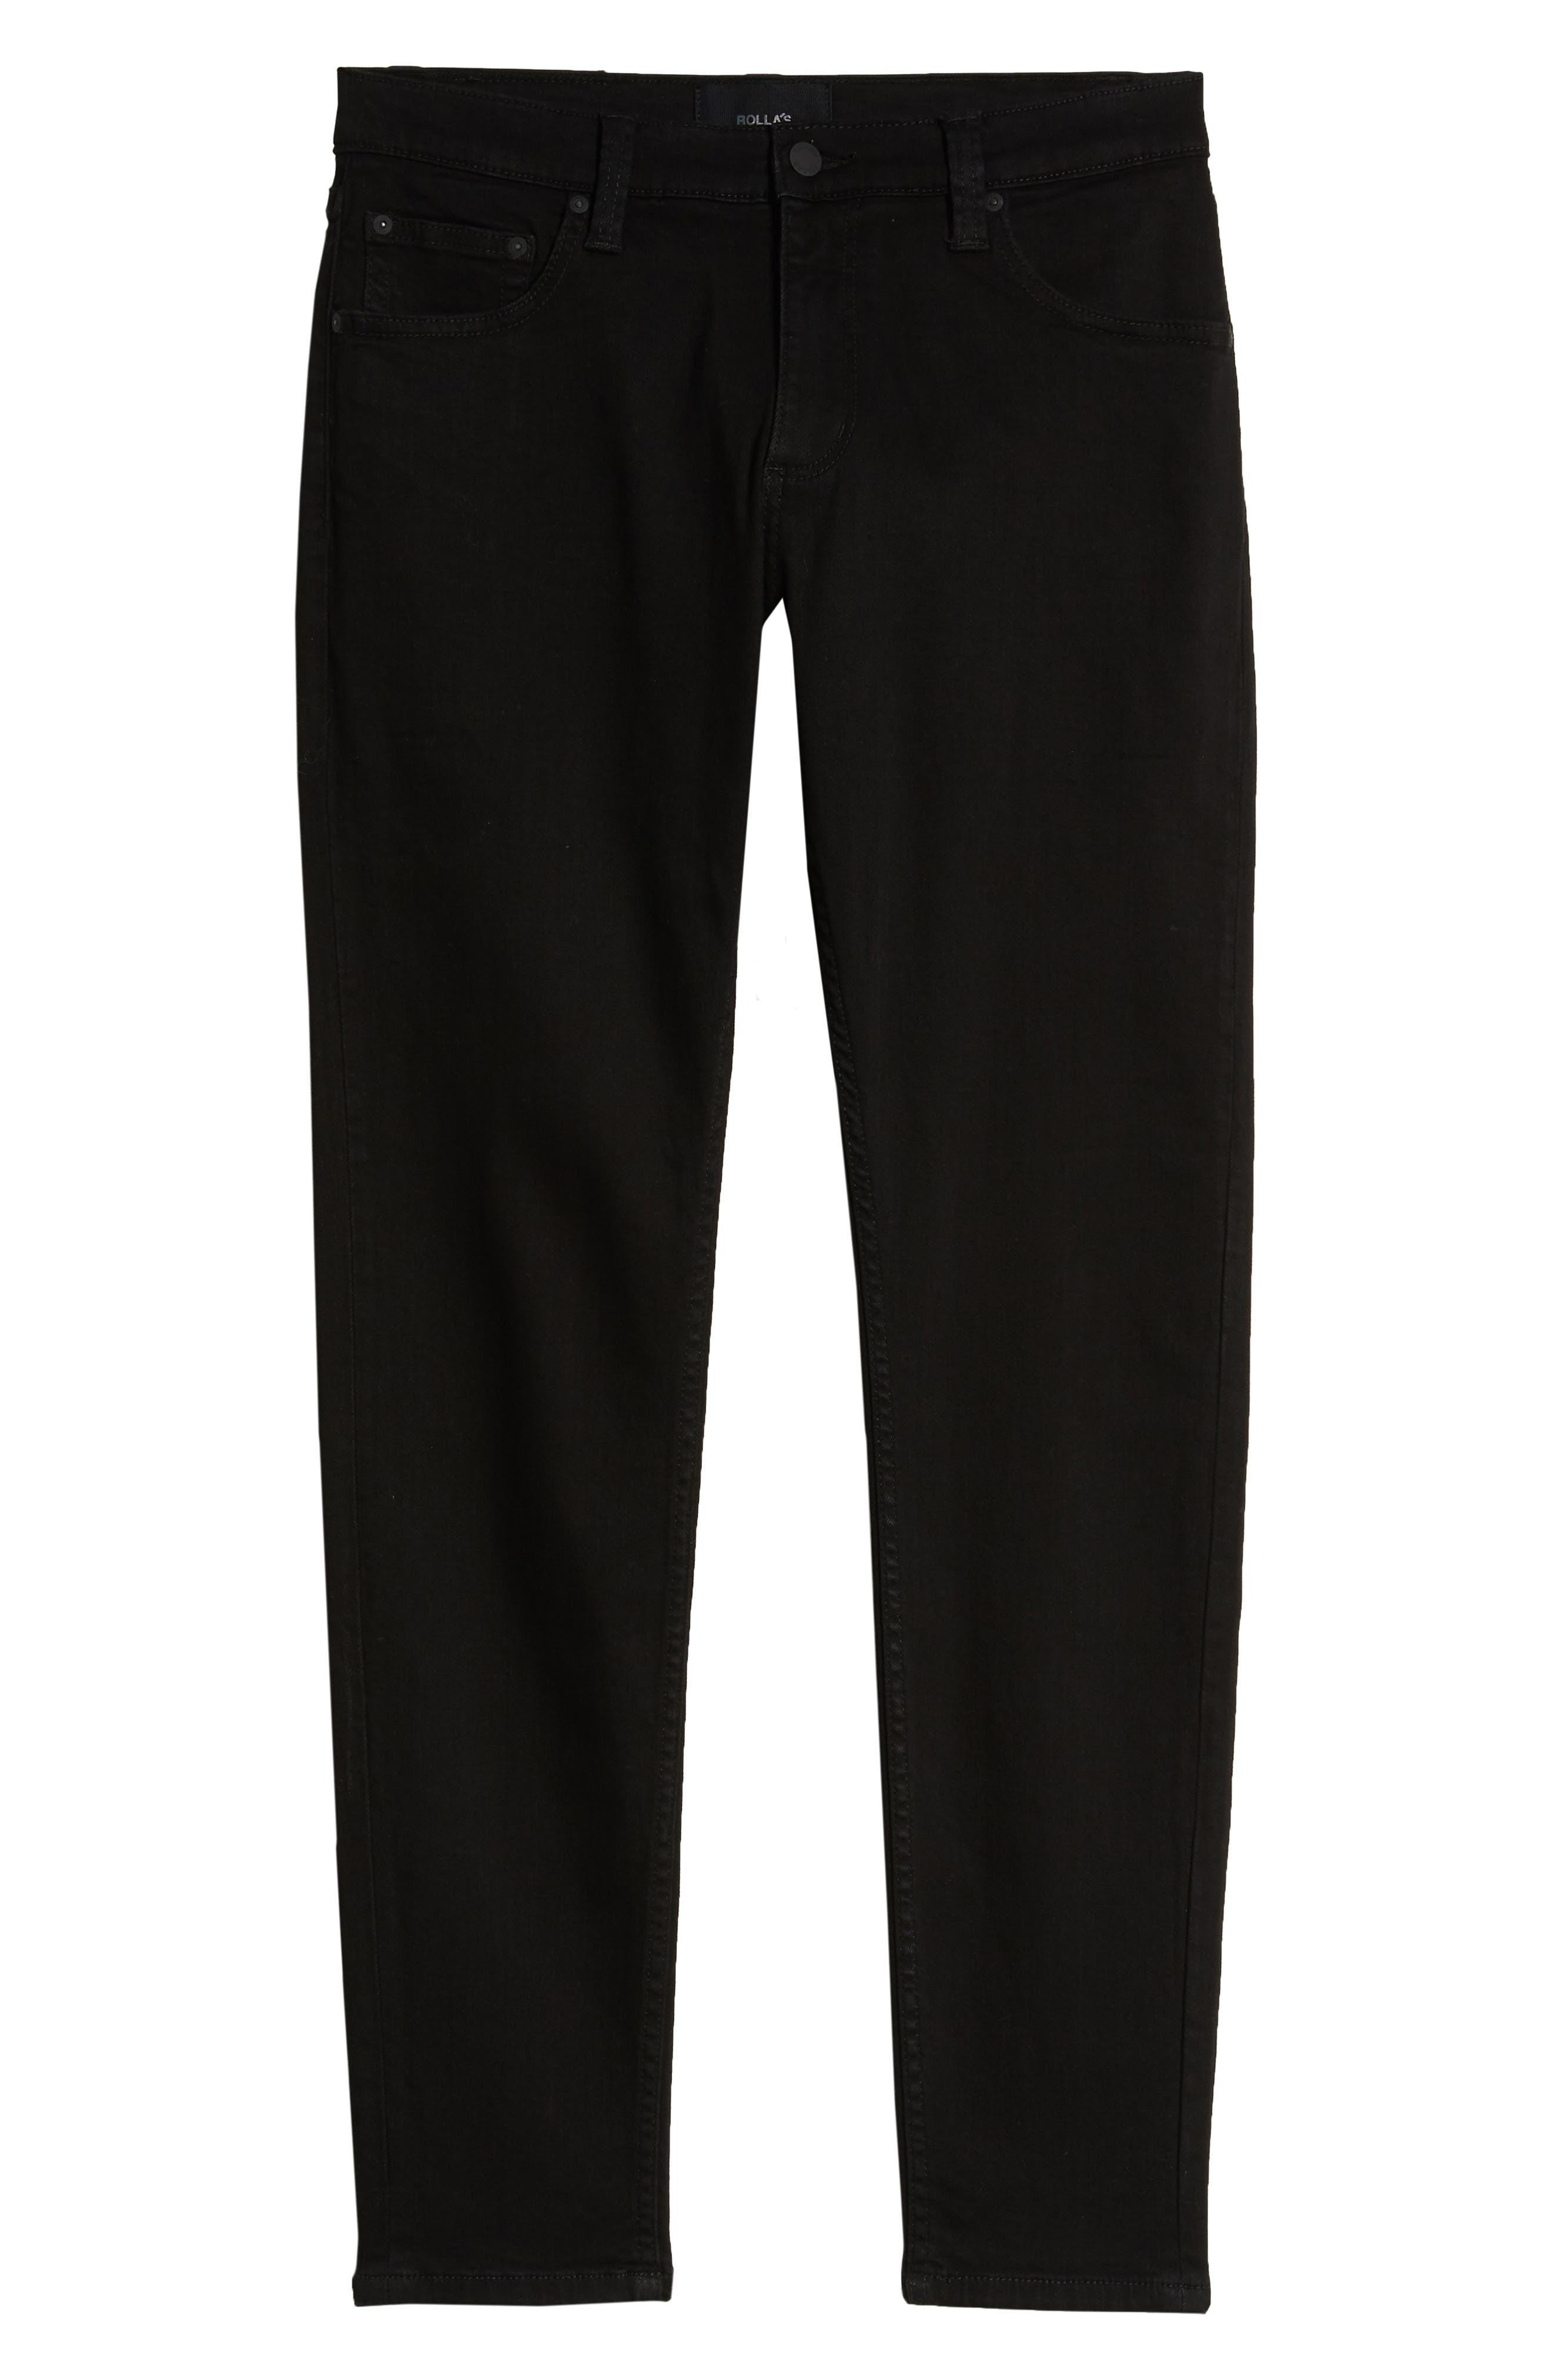 ROLLA'S,                             Stinger Skinny Fit Jeans,                             Alternate thumbnail 4, color,                             BLACK GOLD